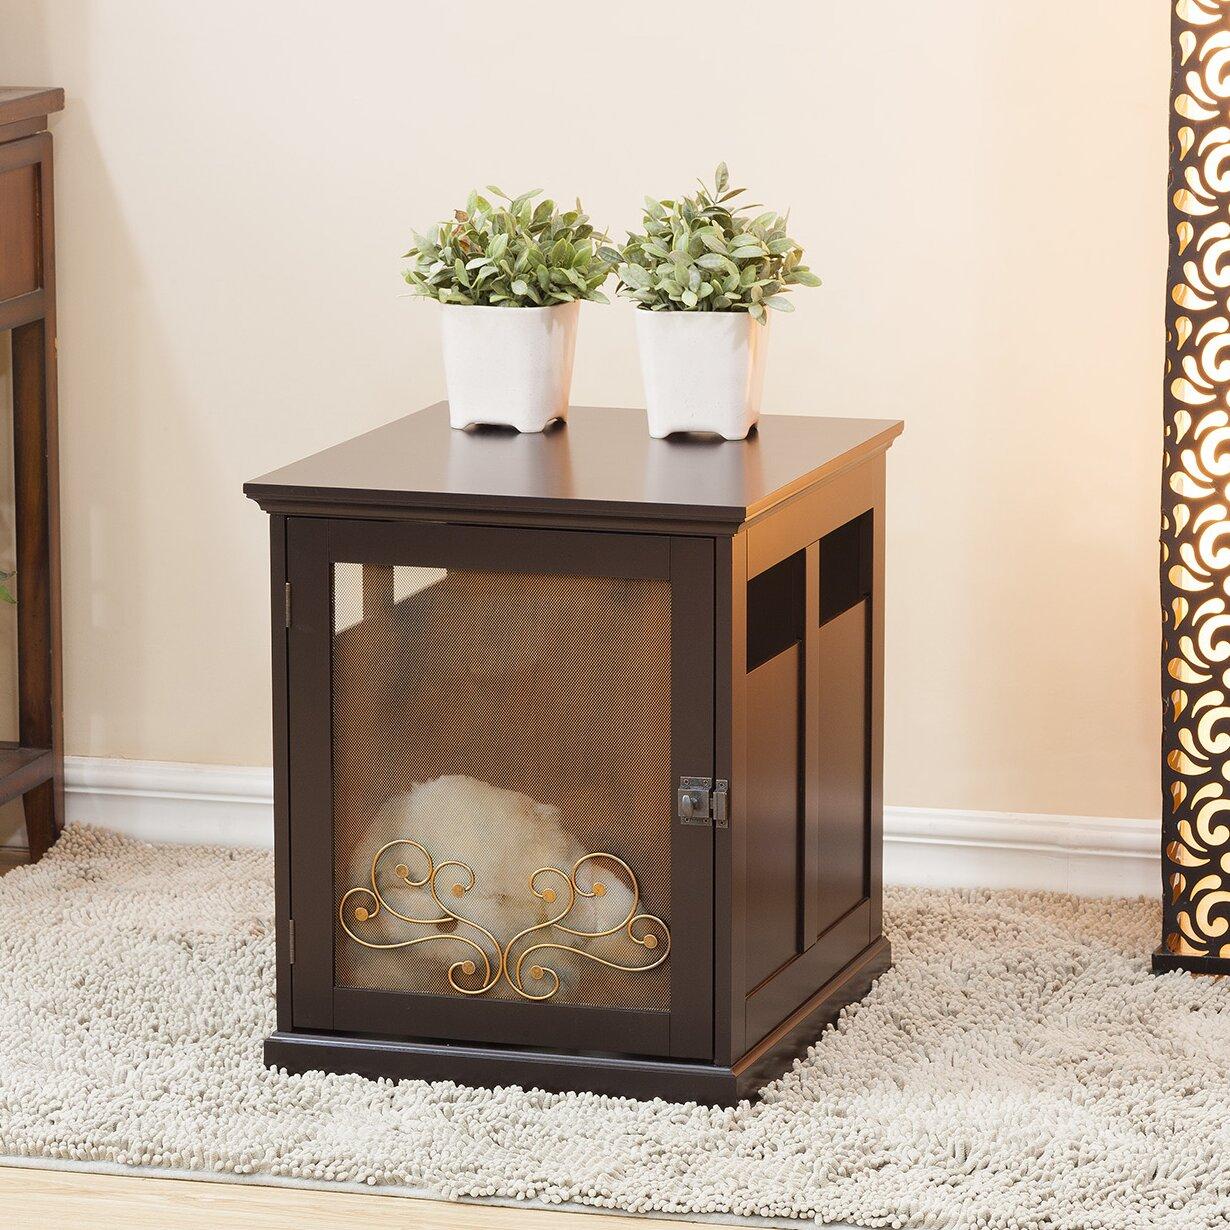 Elegant Home Fashions Jax Dog Crate. Elegant Home Fashions Jax Dog Crate   Reviews   Wayfair